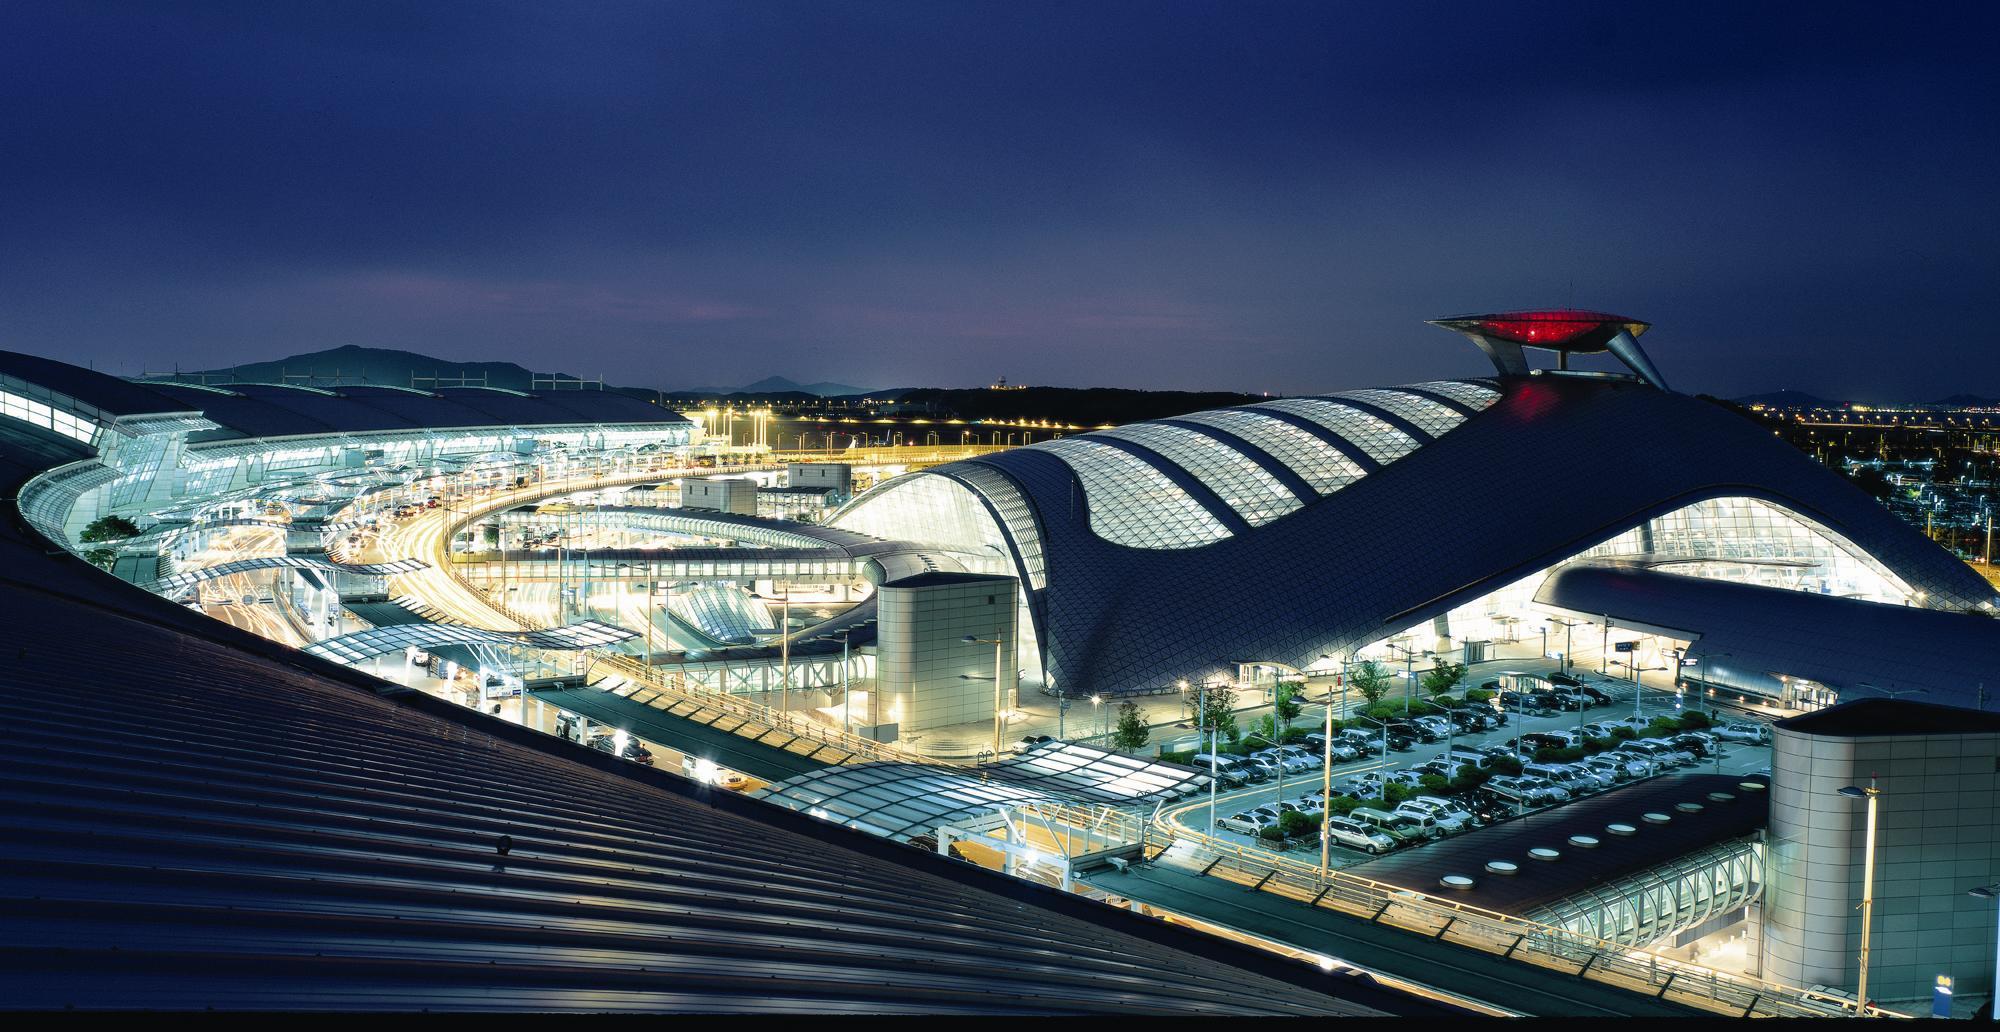 south korea airport 2 - photo #7